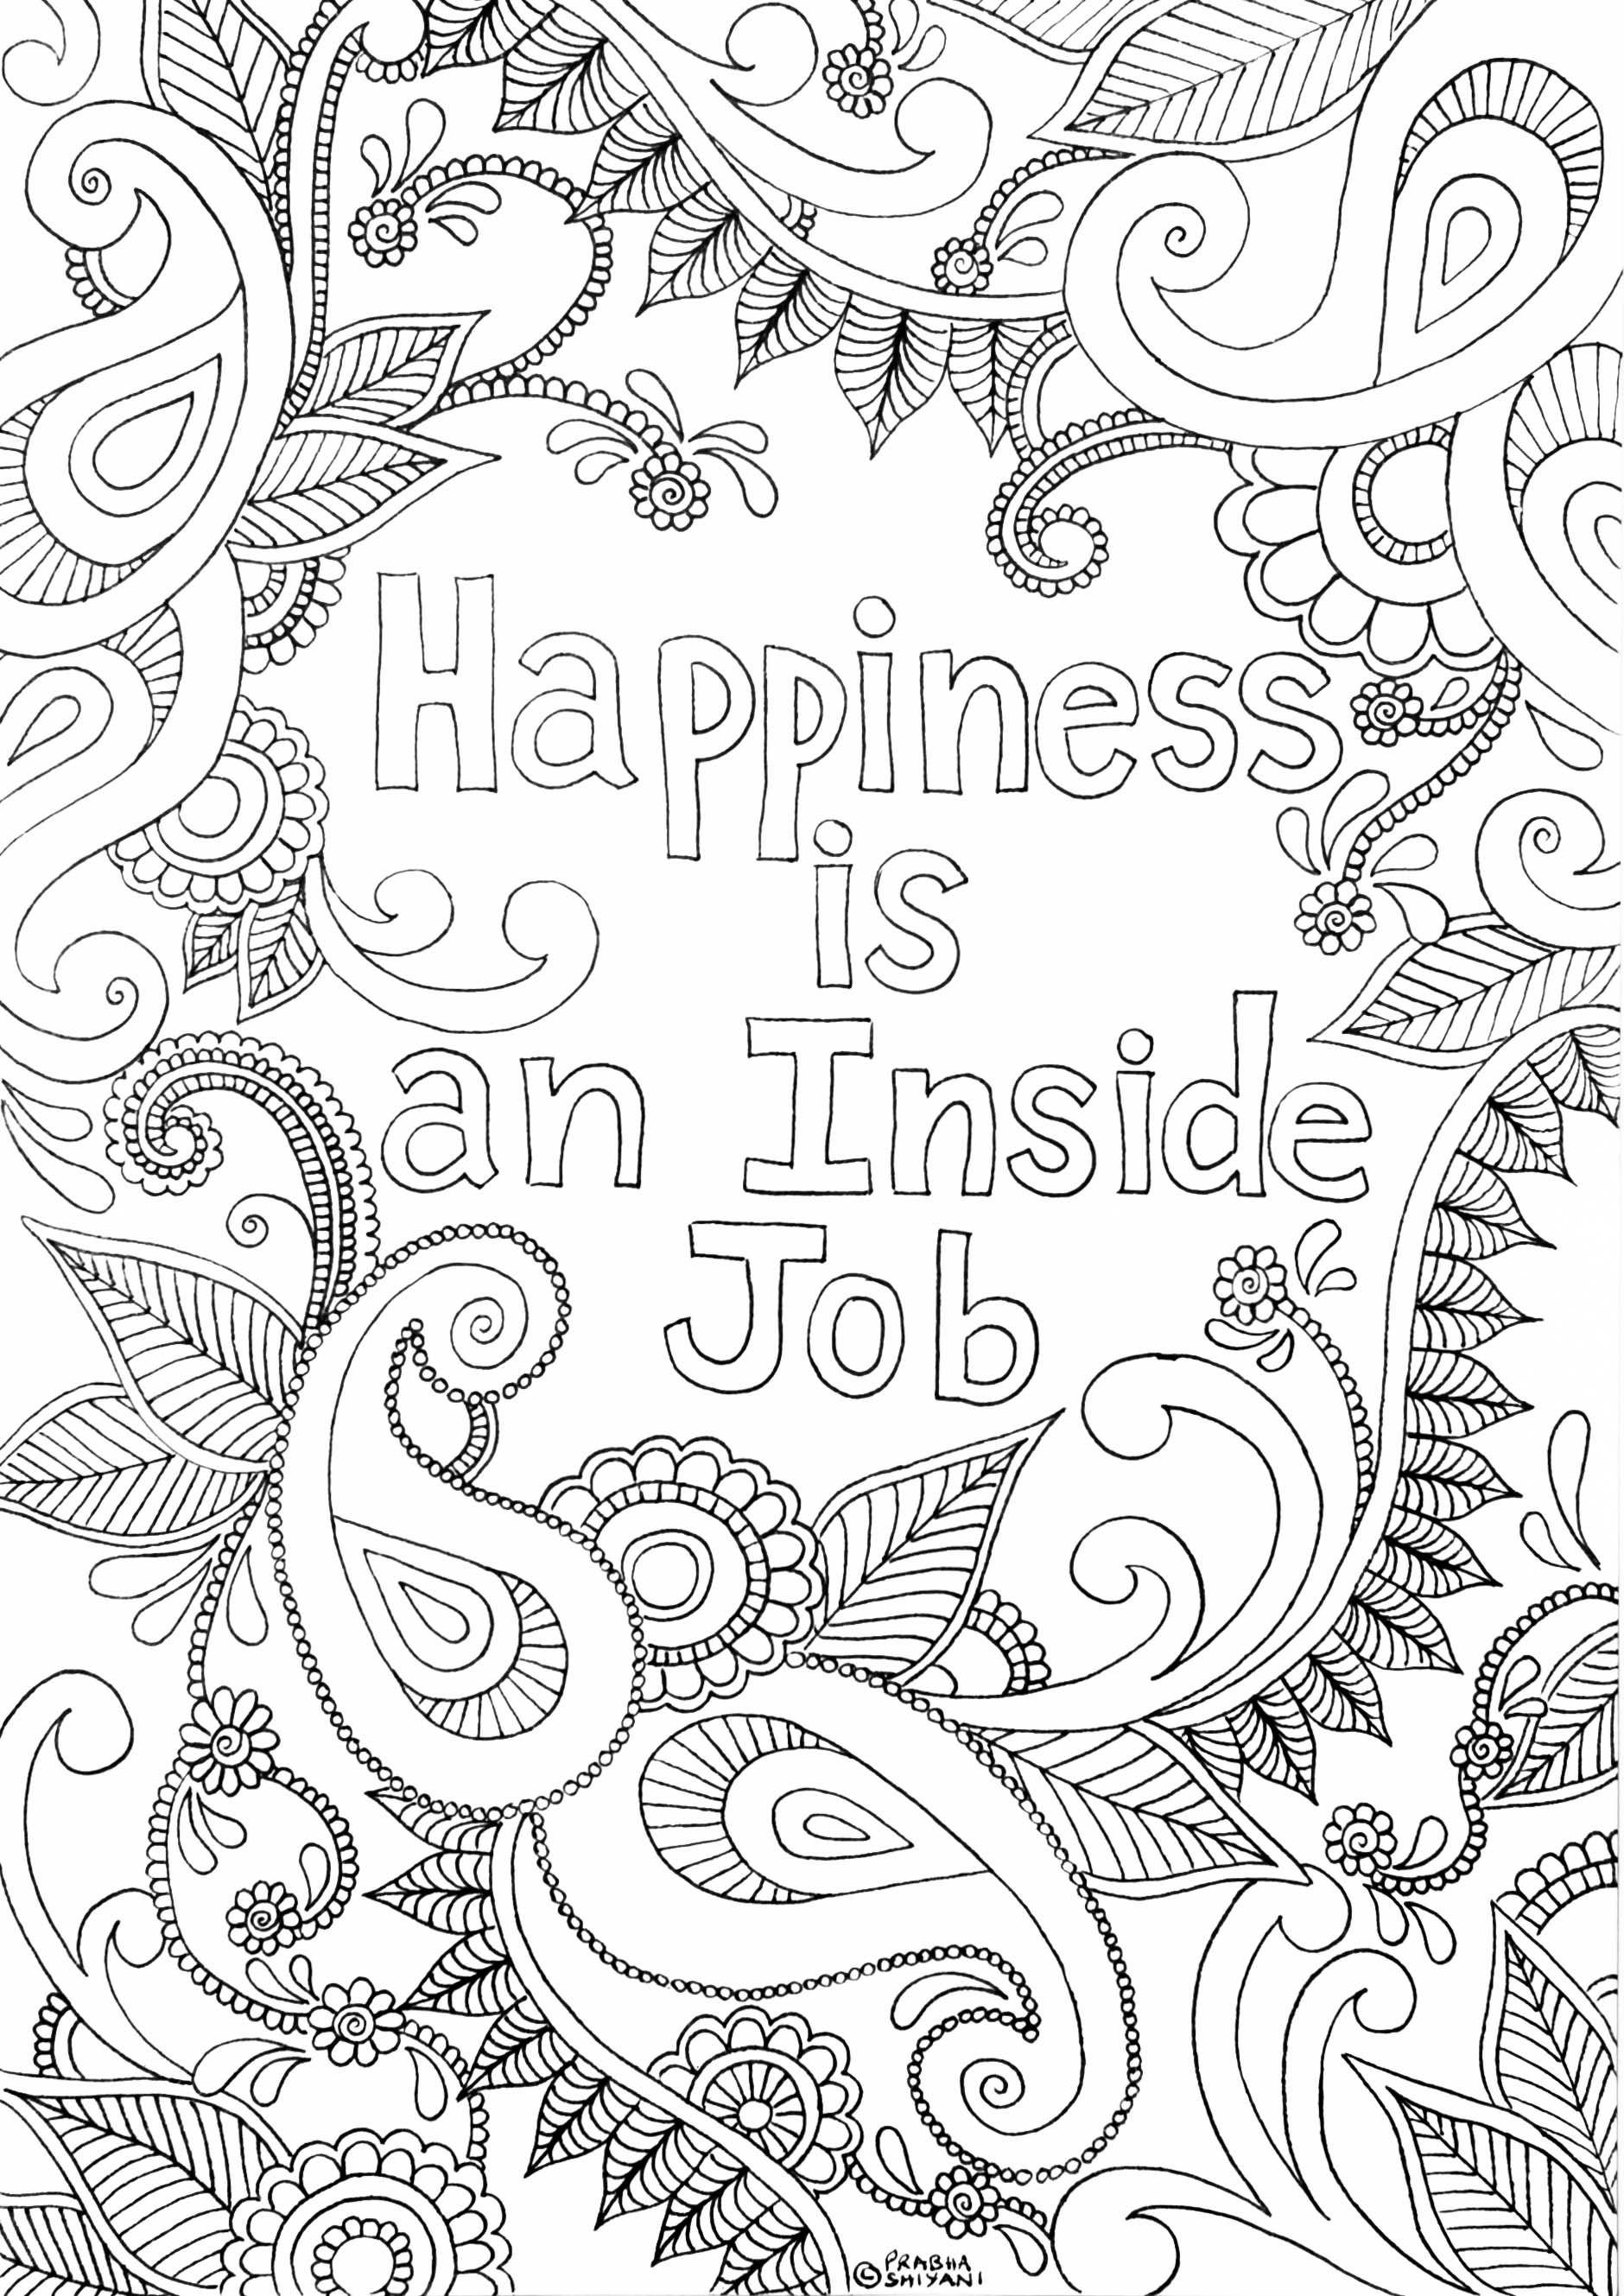 Mindful Affirmation Colouring Book Flourish Wellbeing Coloring Pages Quote Coloring Pages Coloring Books